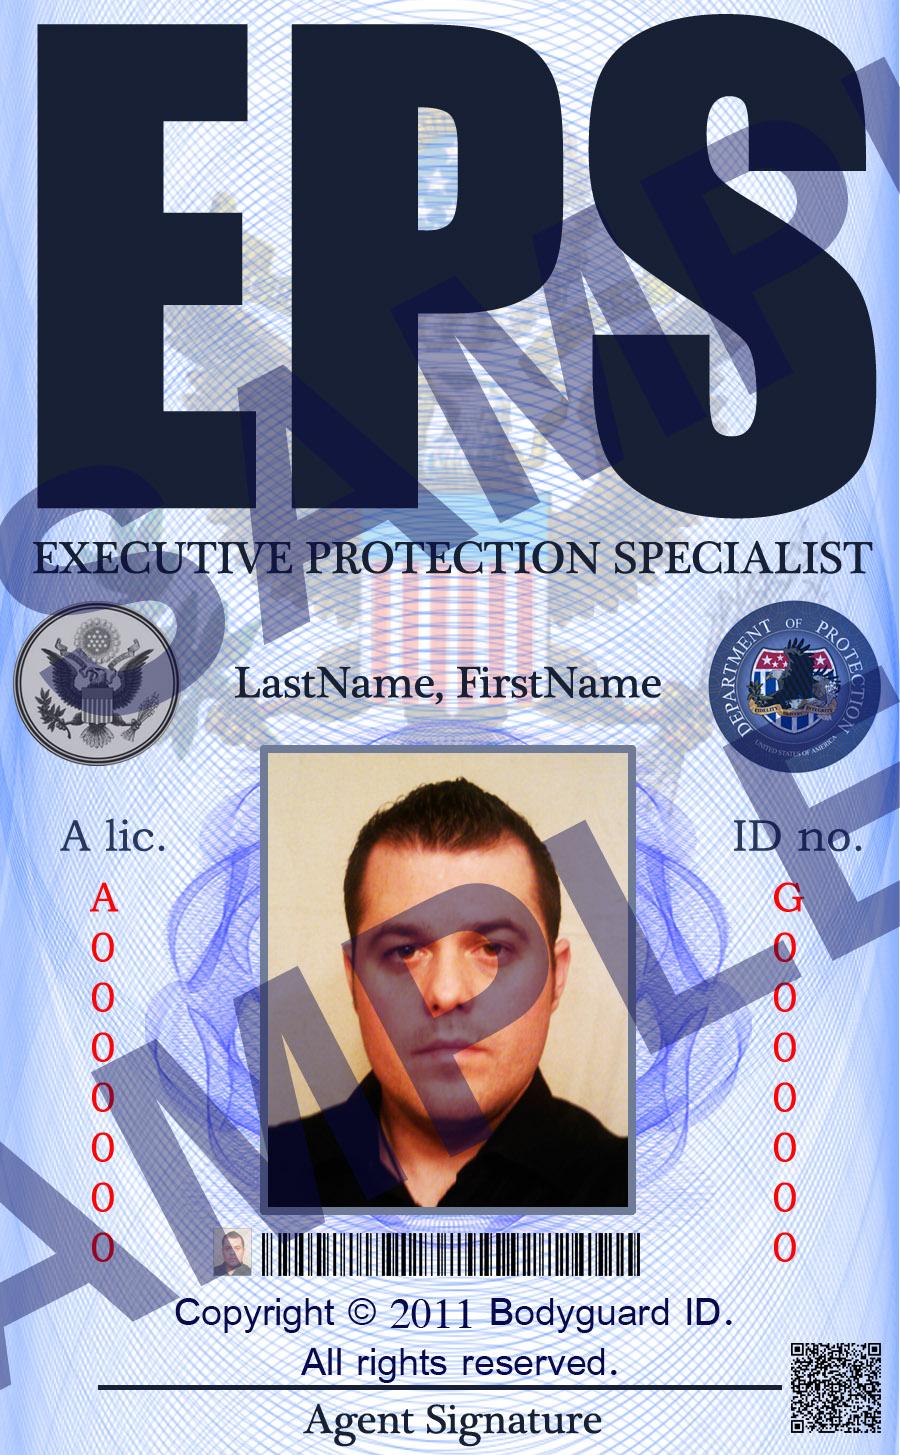 executive protection specialist - Monza berglauf-verband com